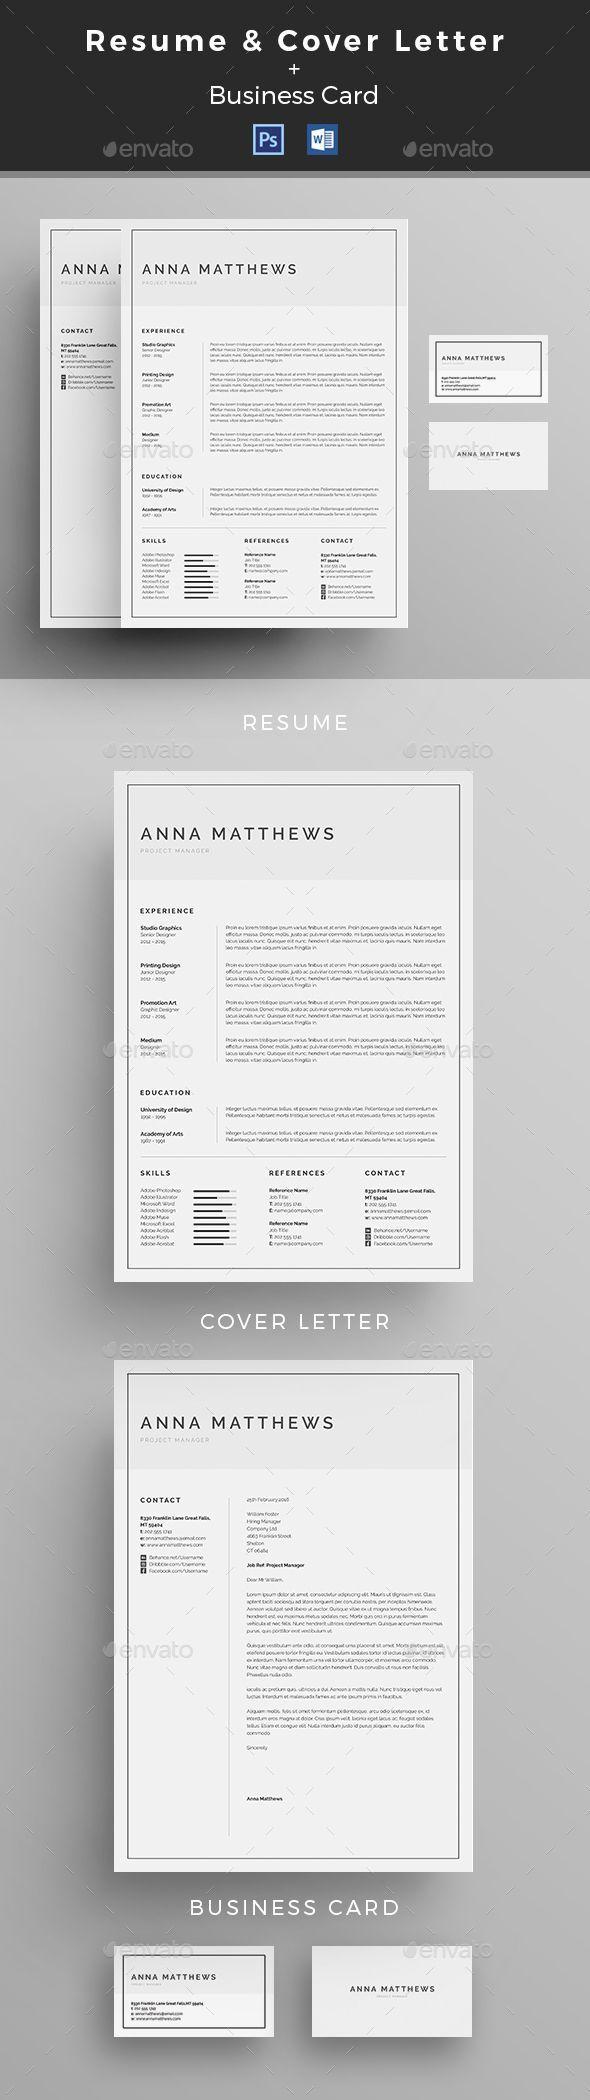 Minimal Resume | CV  — PSD Template #creative #cover letter • Download ➝ https://graphicriver.net/item/minimal-resume-cv/18118283?ref=pxcr #Coverletters